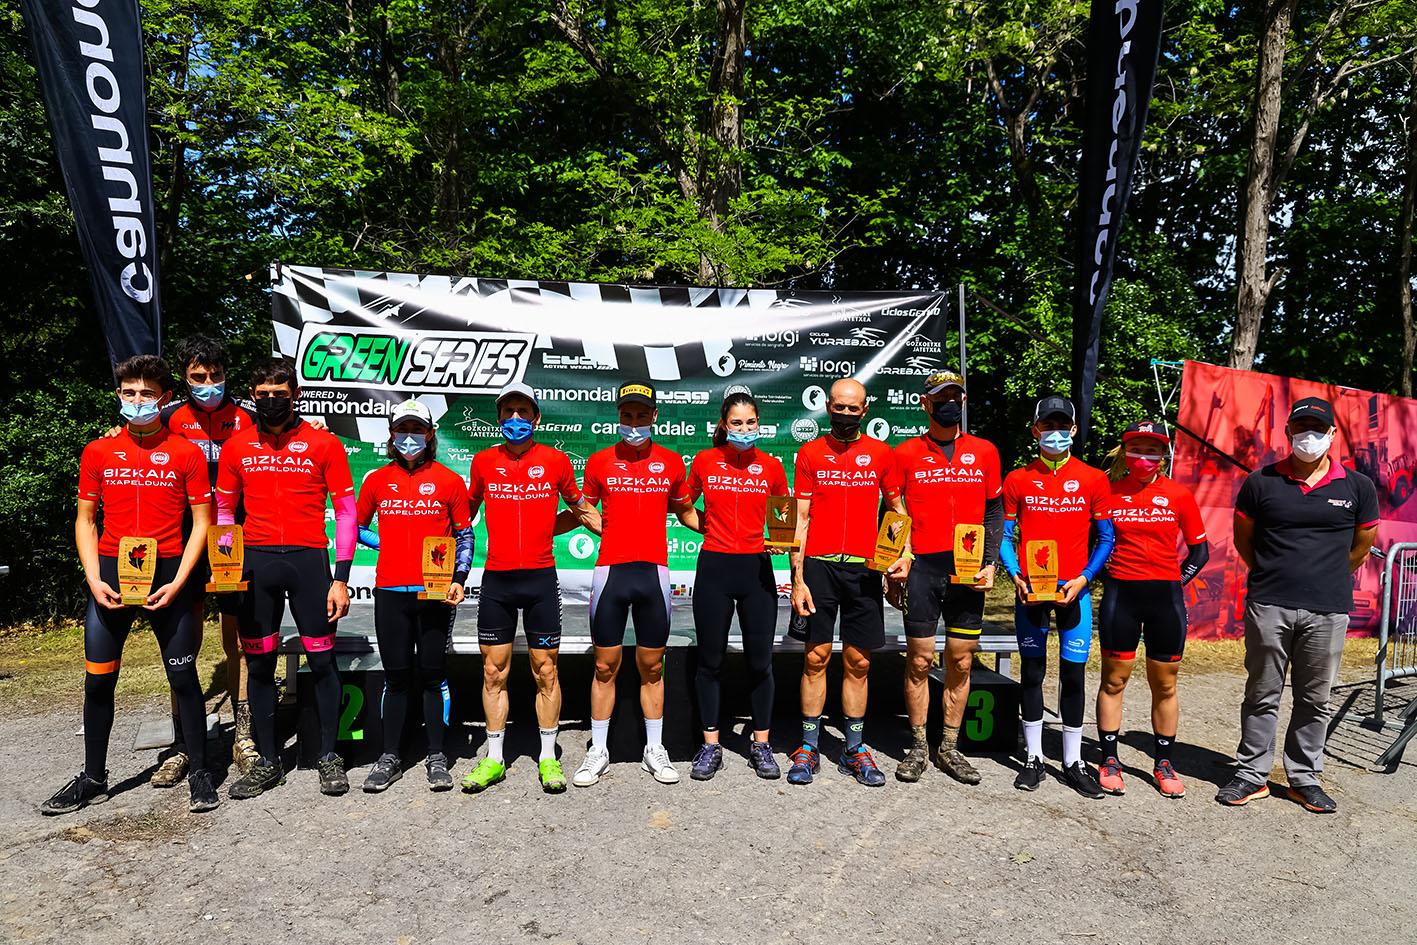 Green Series Challenge XCO powered by Cannondale 5 Lezama Campeonato Bizkaiajpg